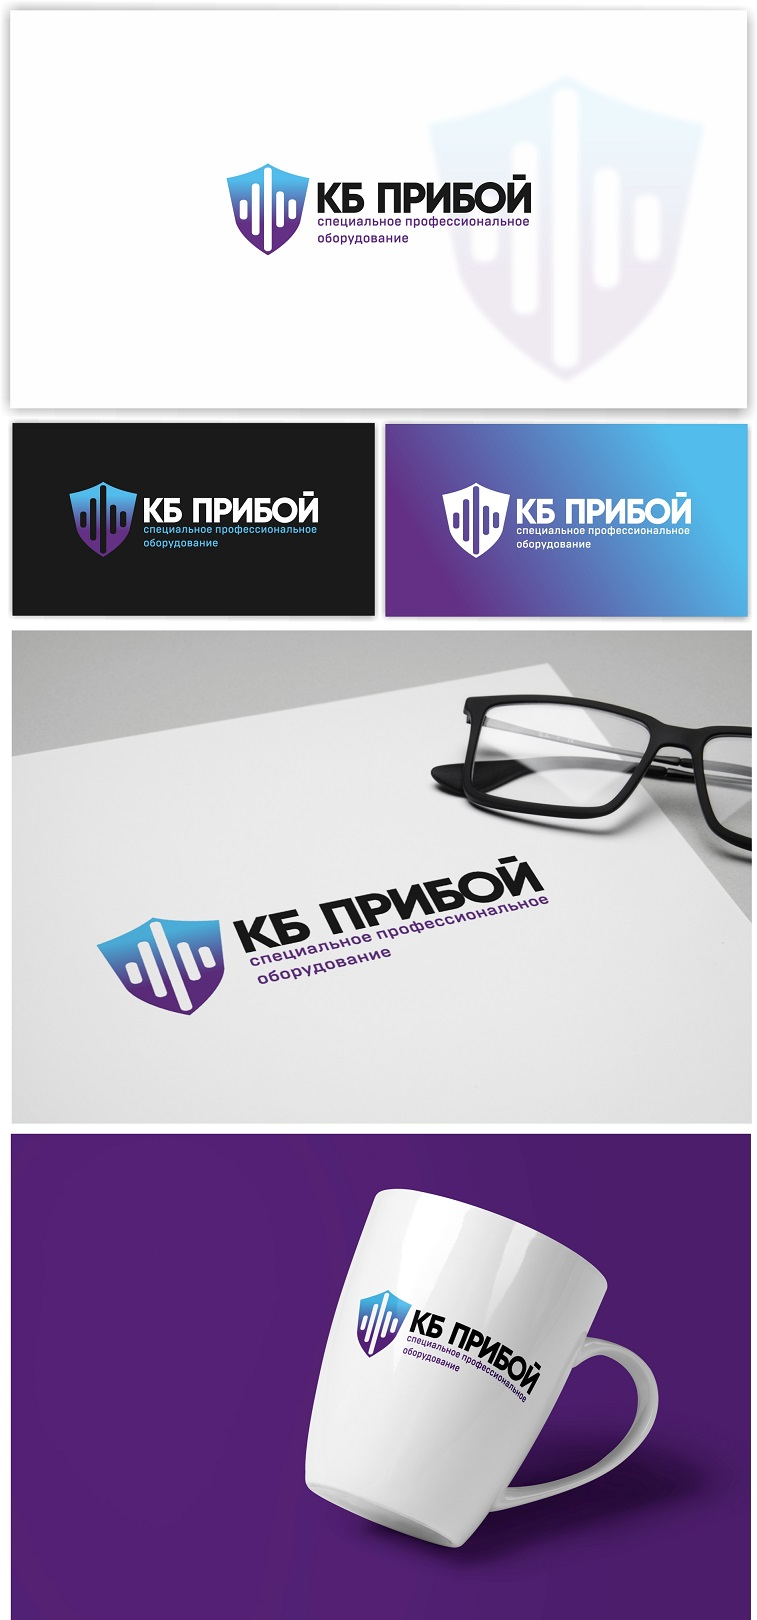 Разработка логотипа и фирменного стиля для КБ Прибой фото f_8435b2677505b4f3.jpg